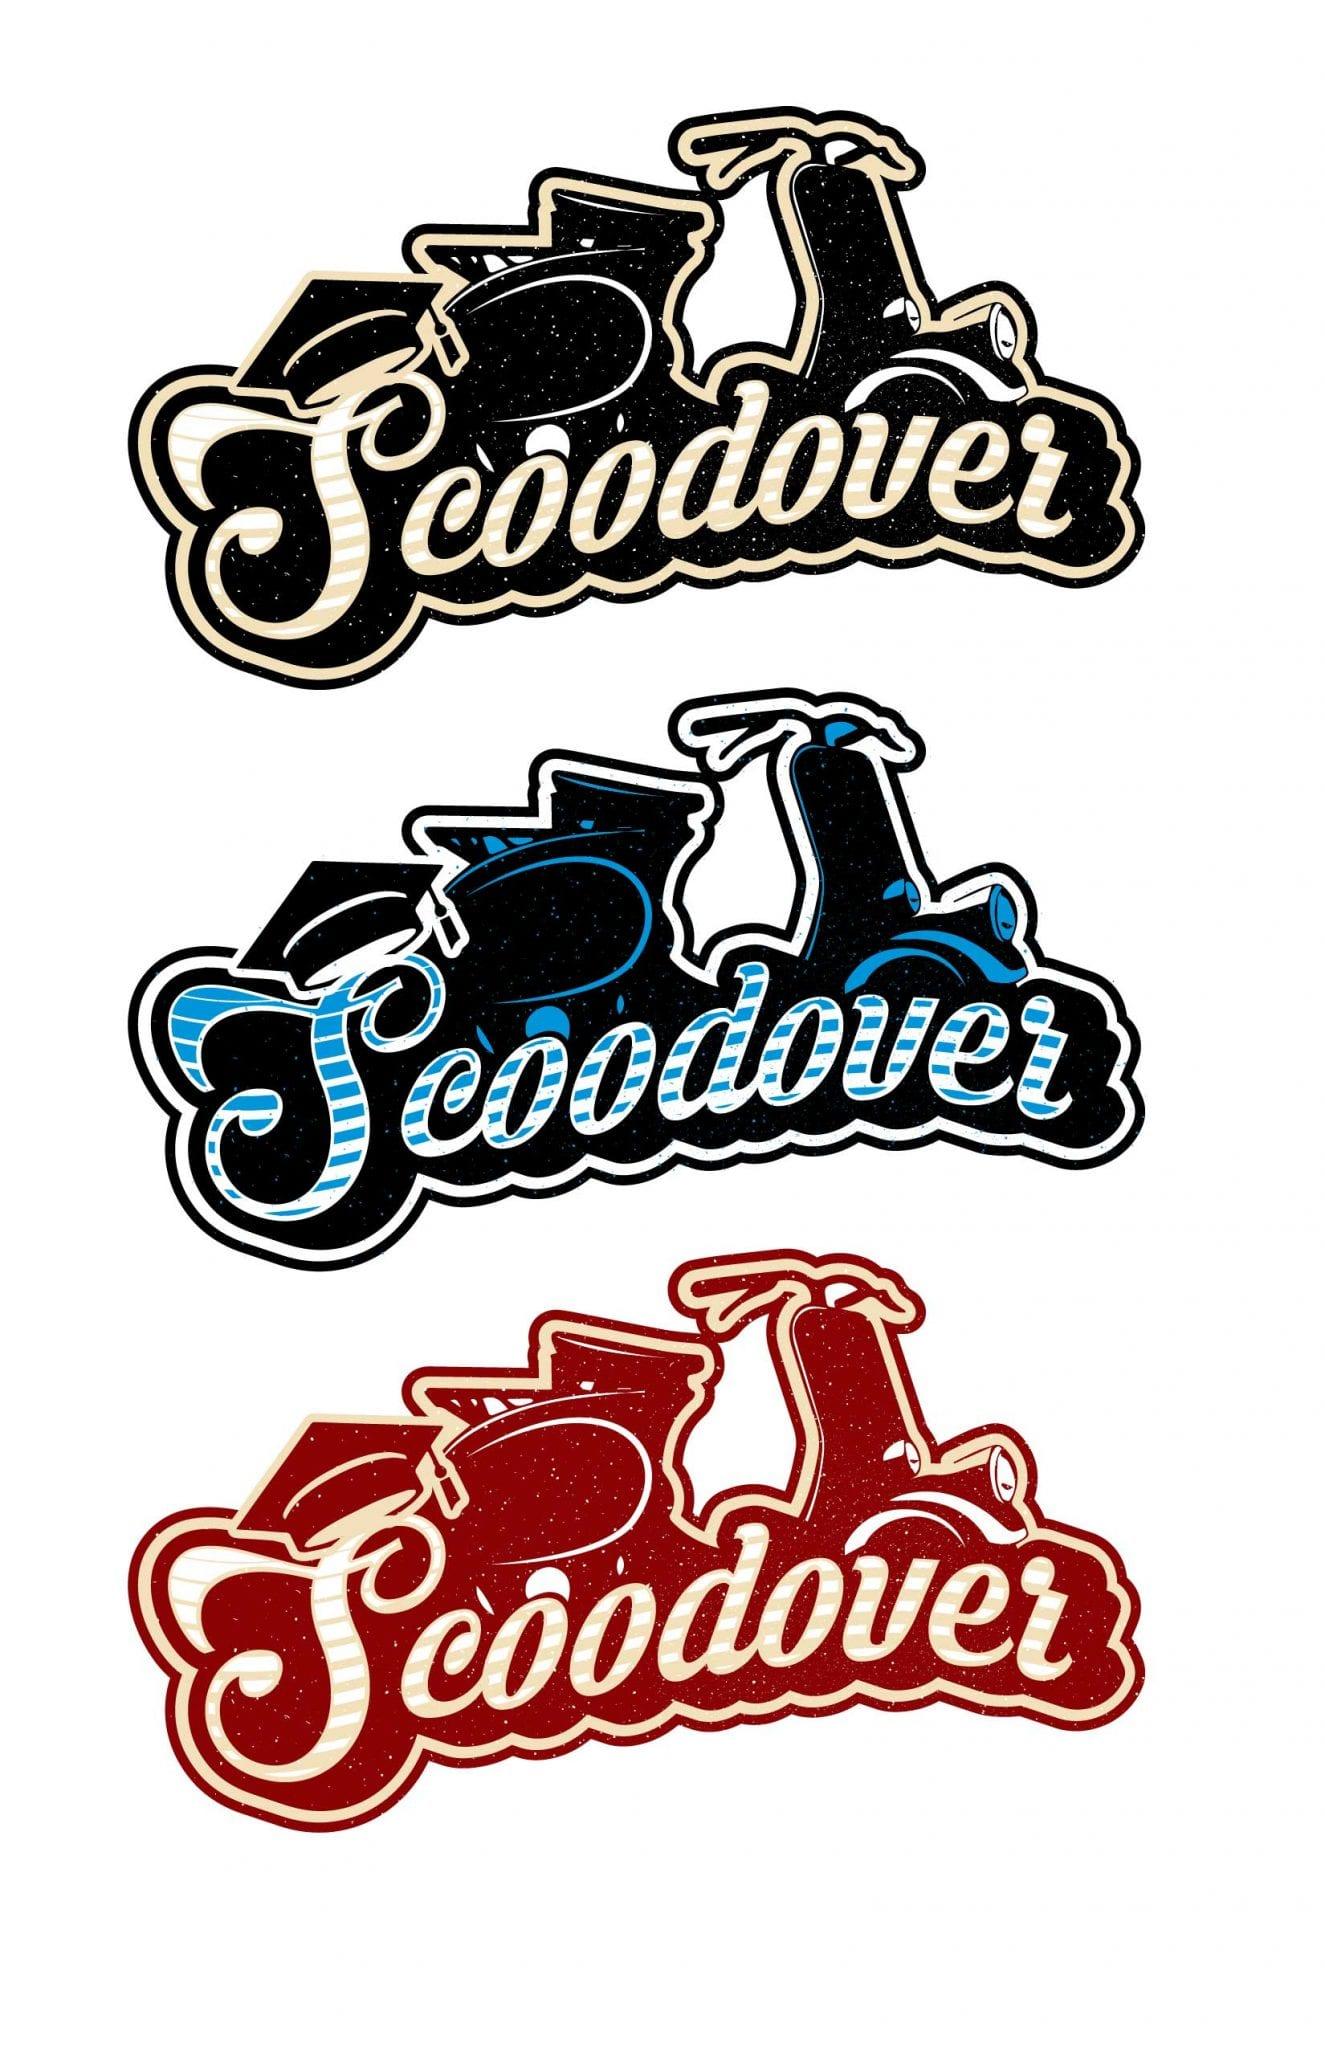 Scoodover cool logo design